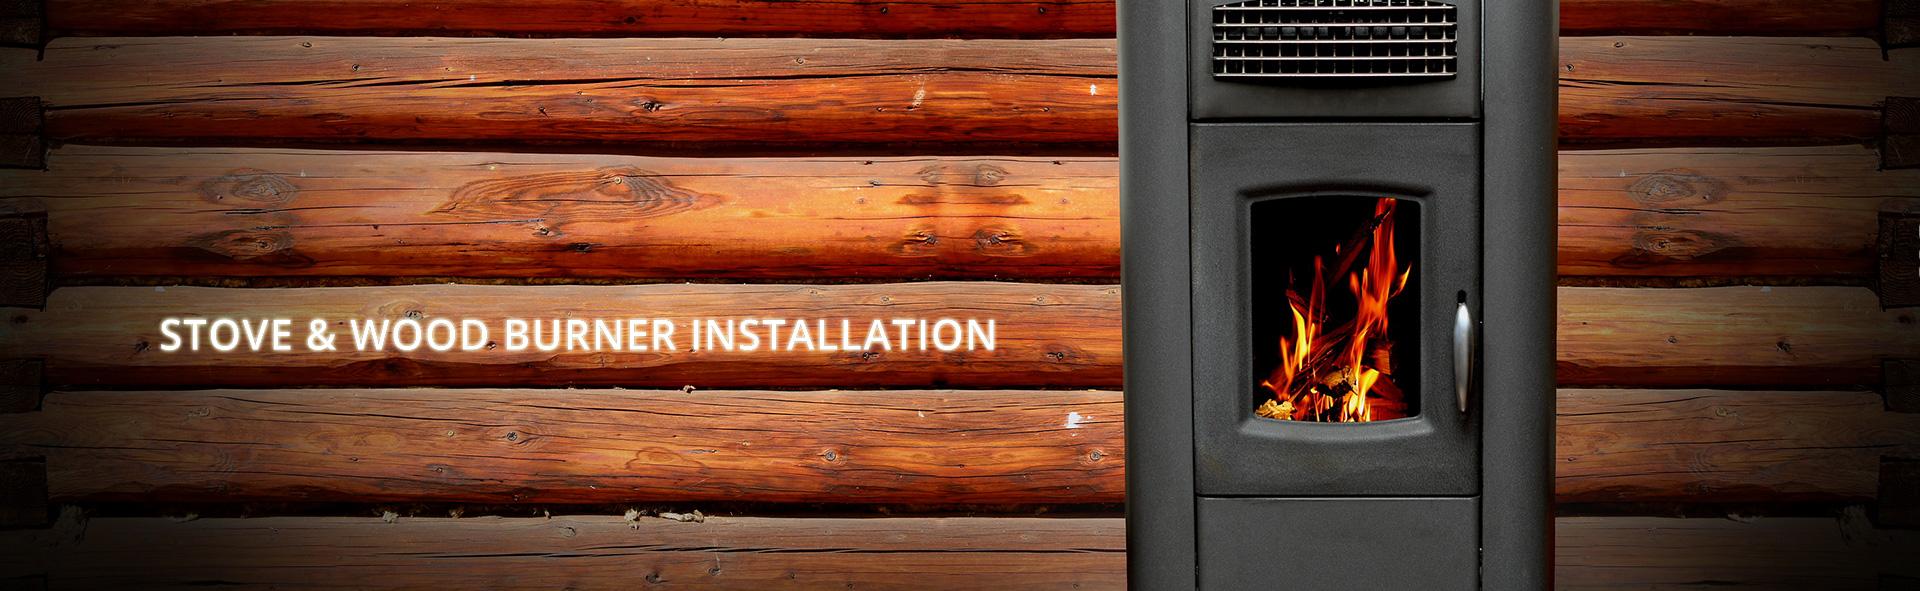 stove-wood-burner-installation